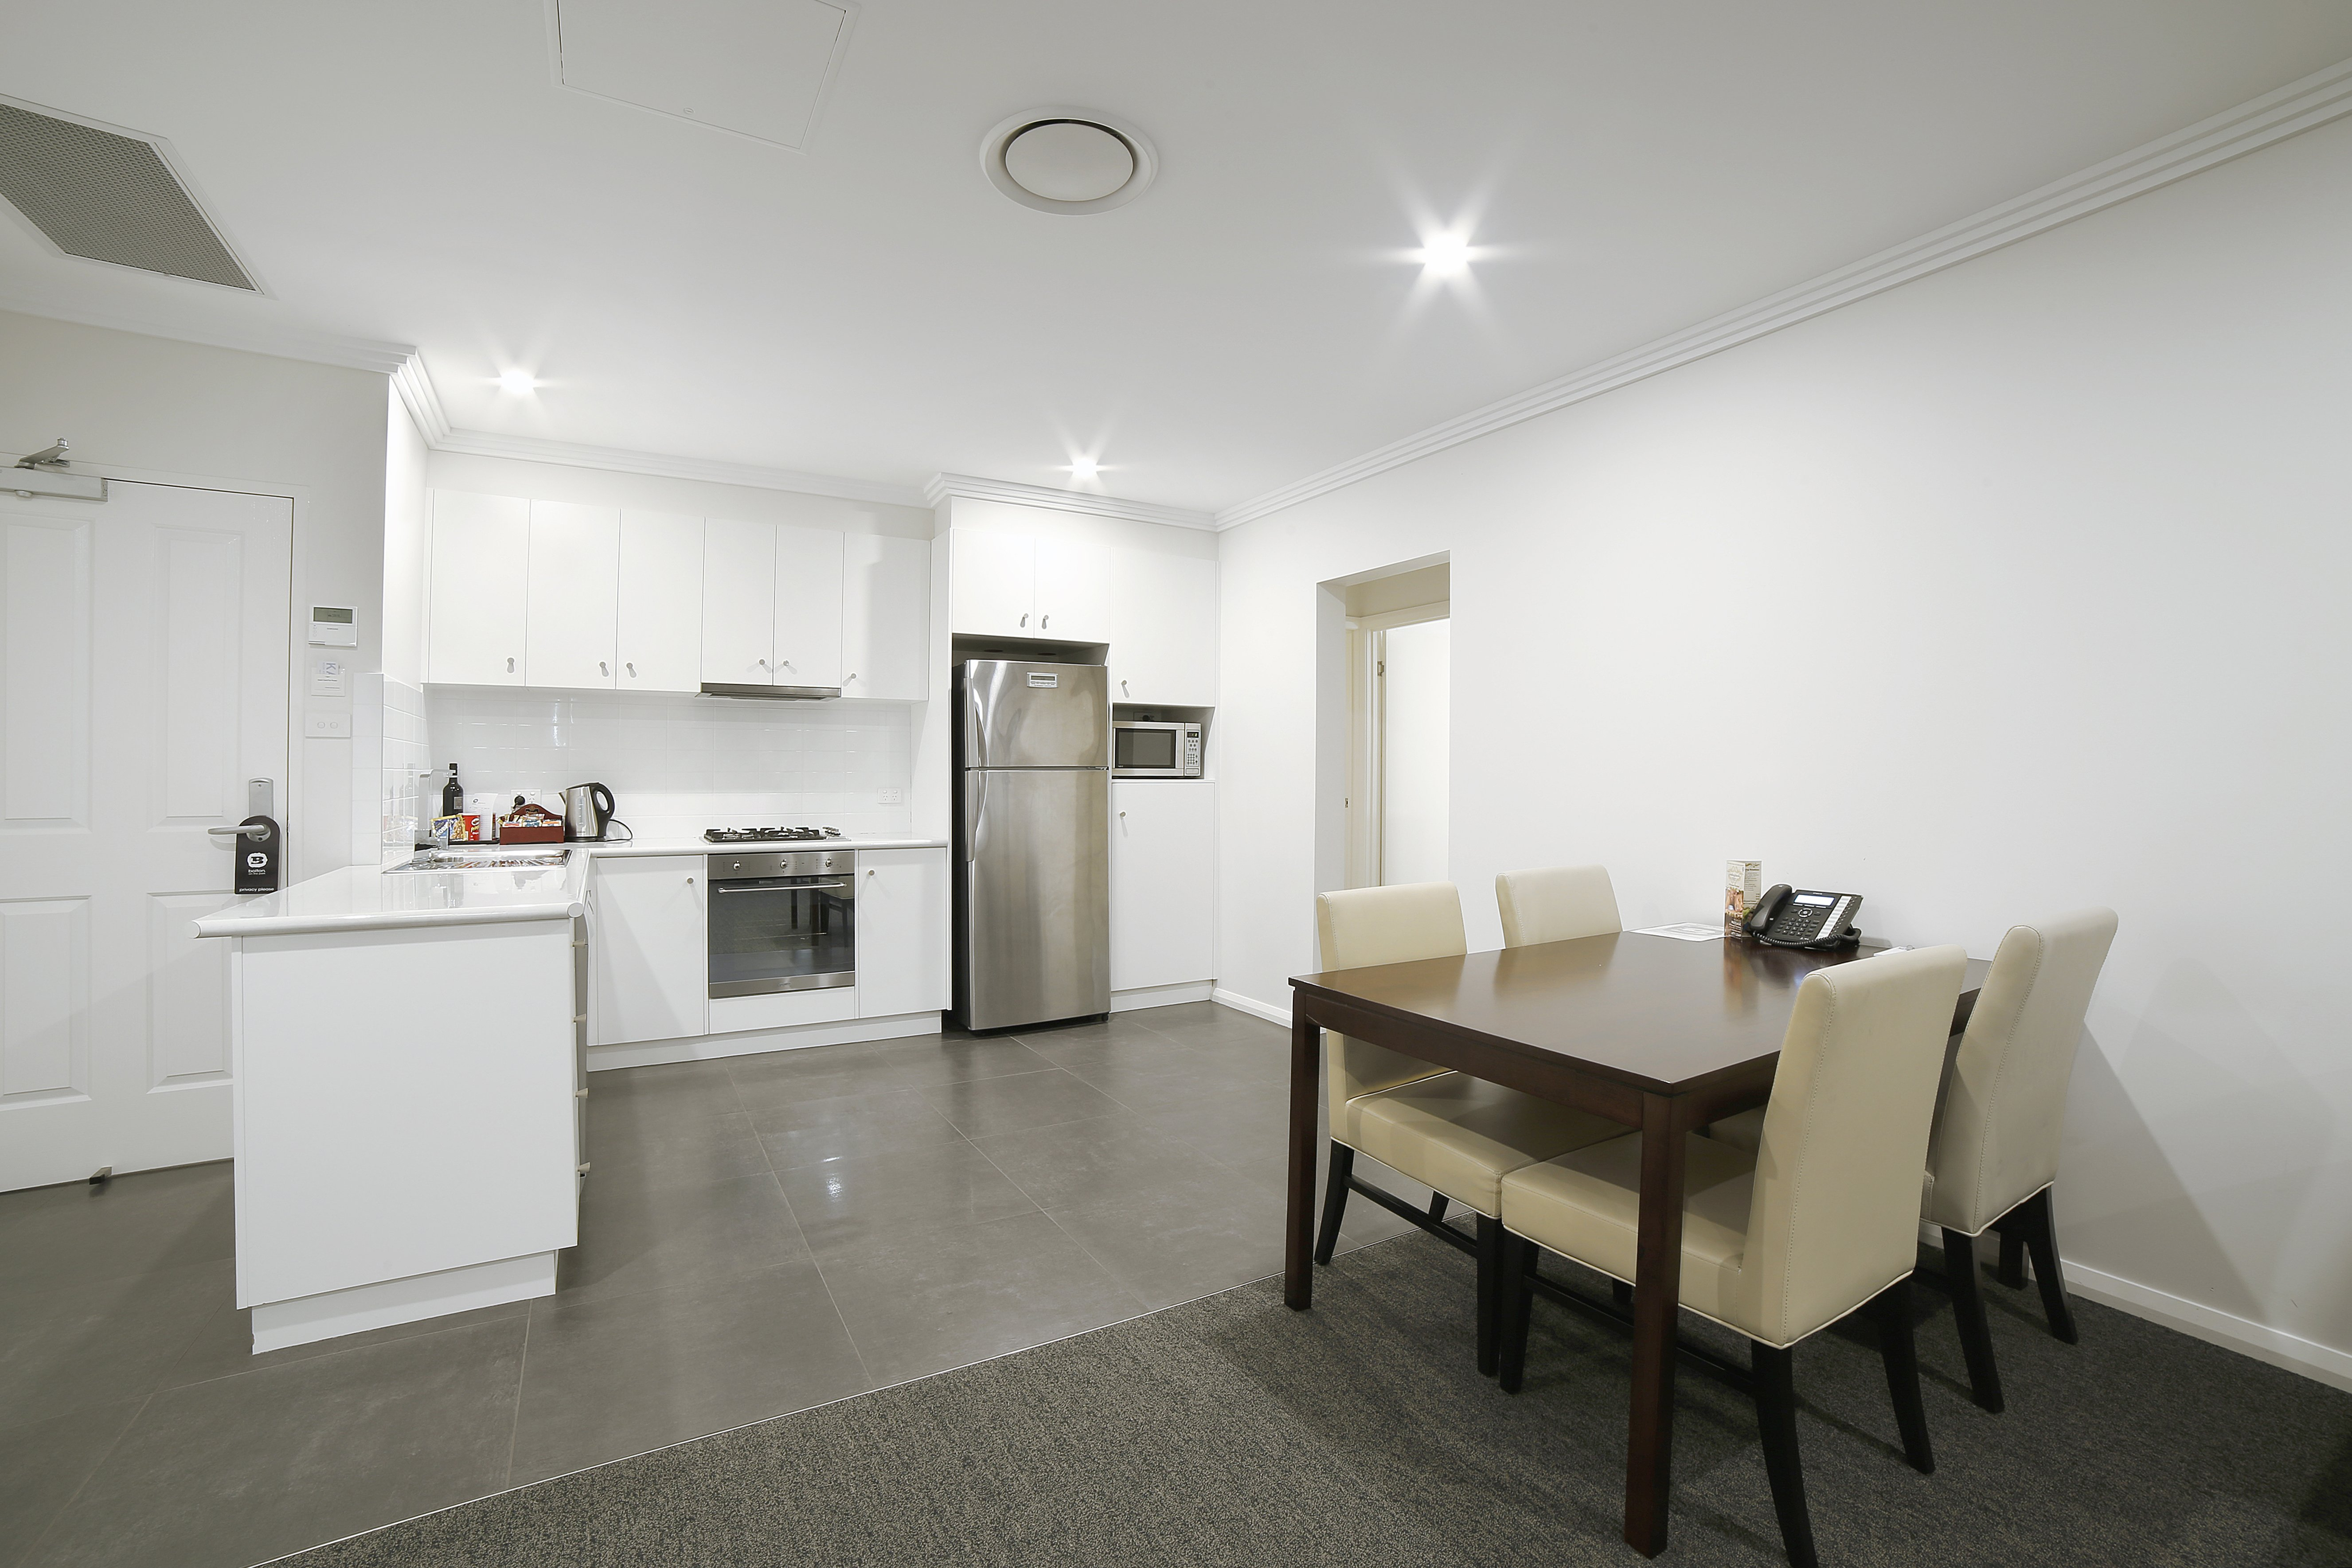 Local Accommodation, Wagga Wagga, NSW